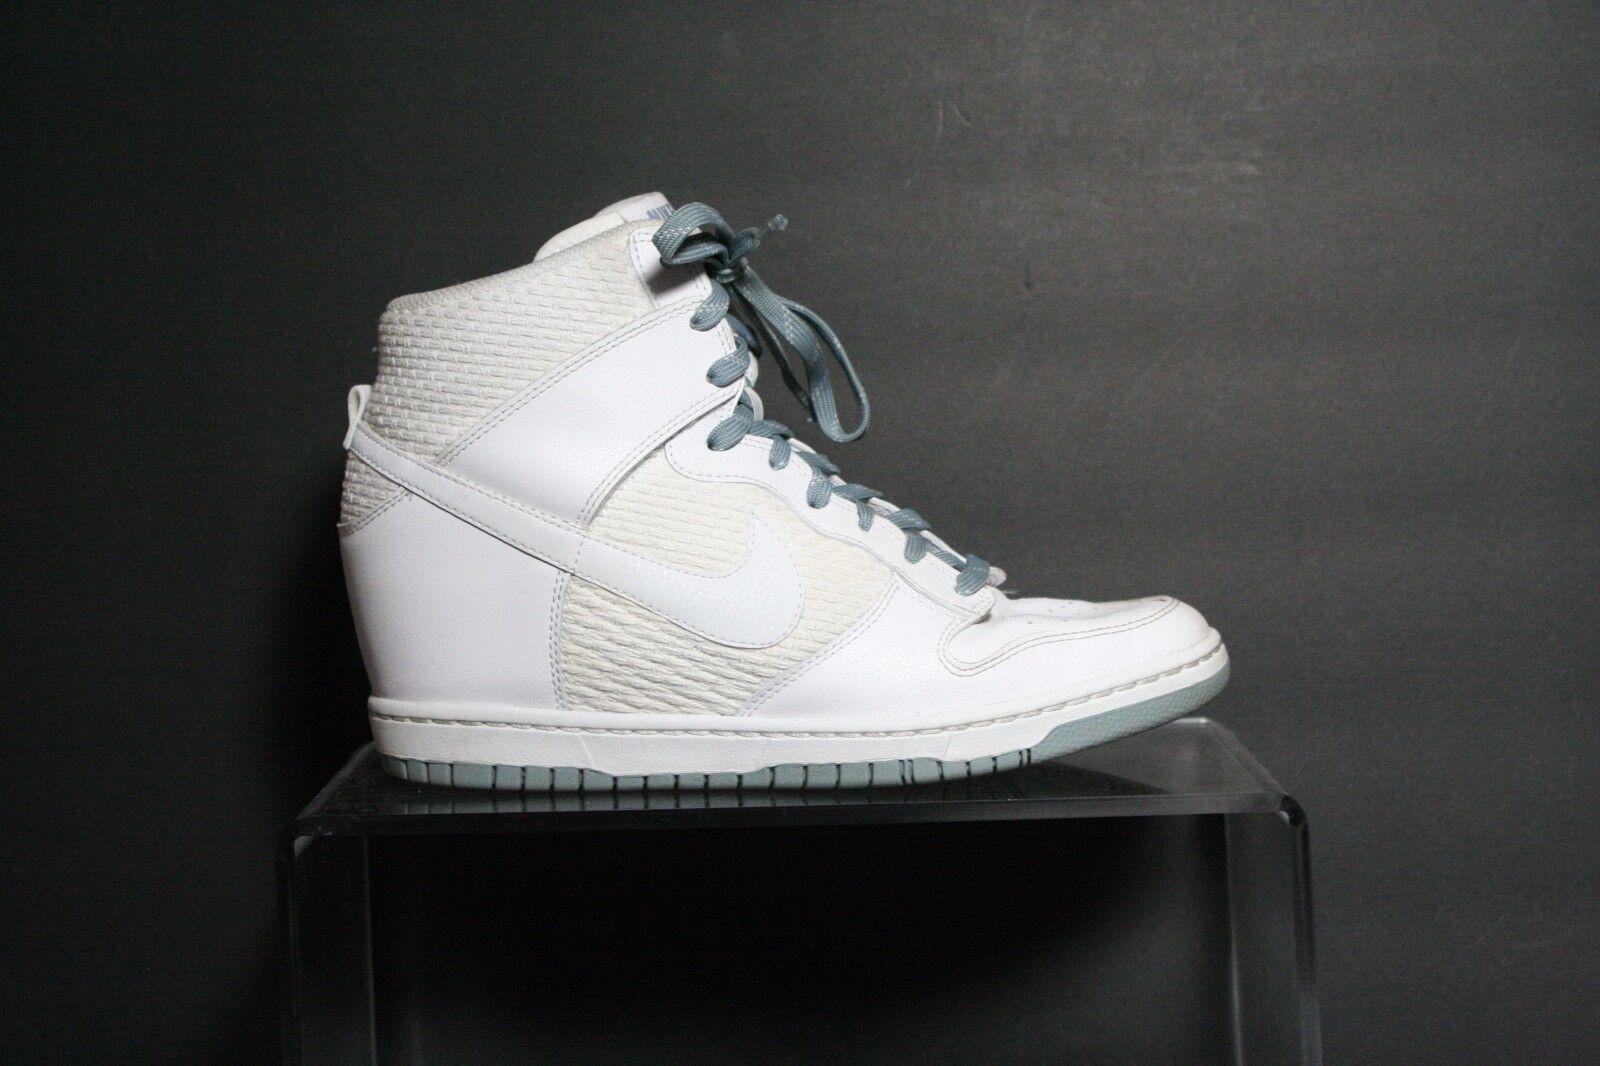 Nike Dunk Sky High High High Essential 14' Sneaker Athletic Multi Hip Women 11 White EUC a1c6e5